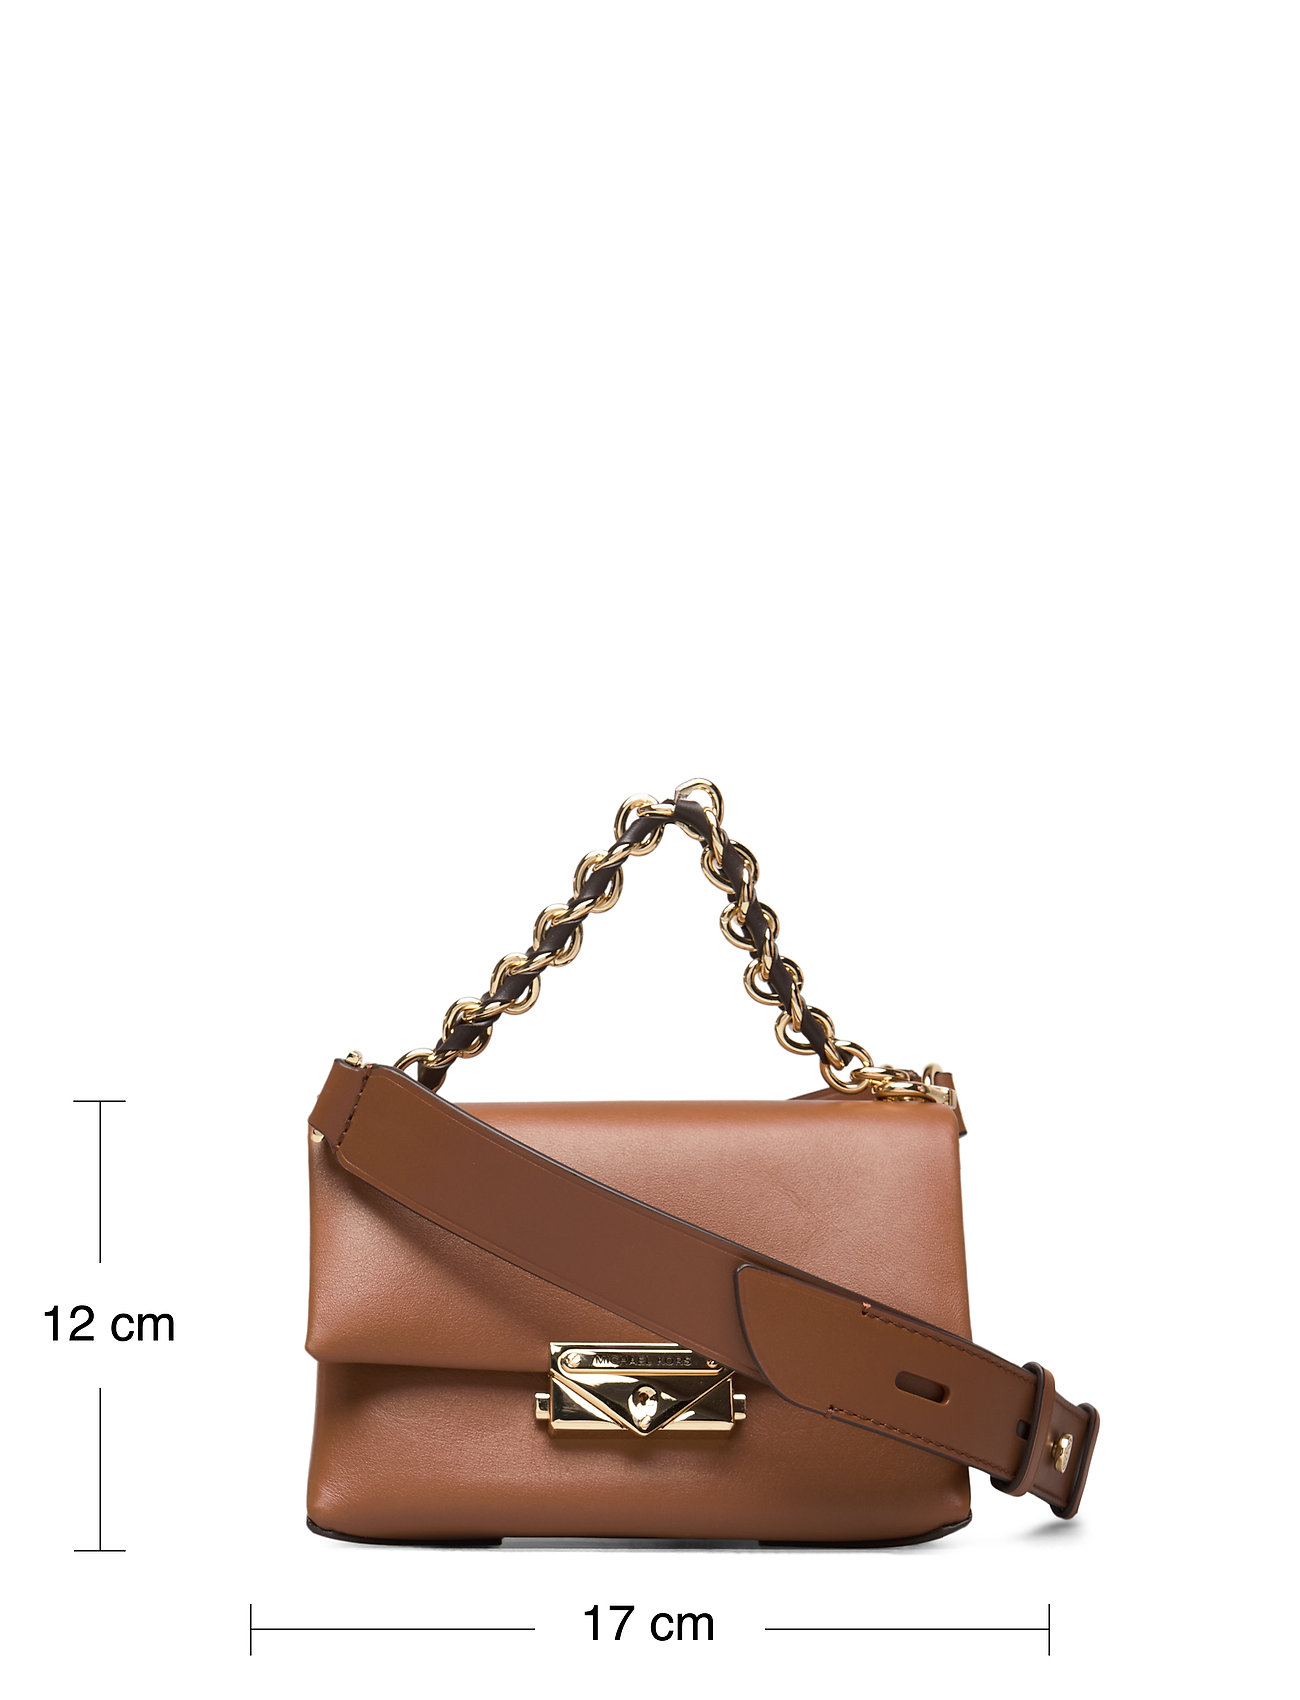 Michael Kors Bags Xs Rbn Chn Xbody - Axelremsväskor Lugg Multi